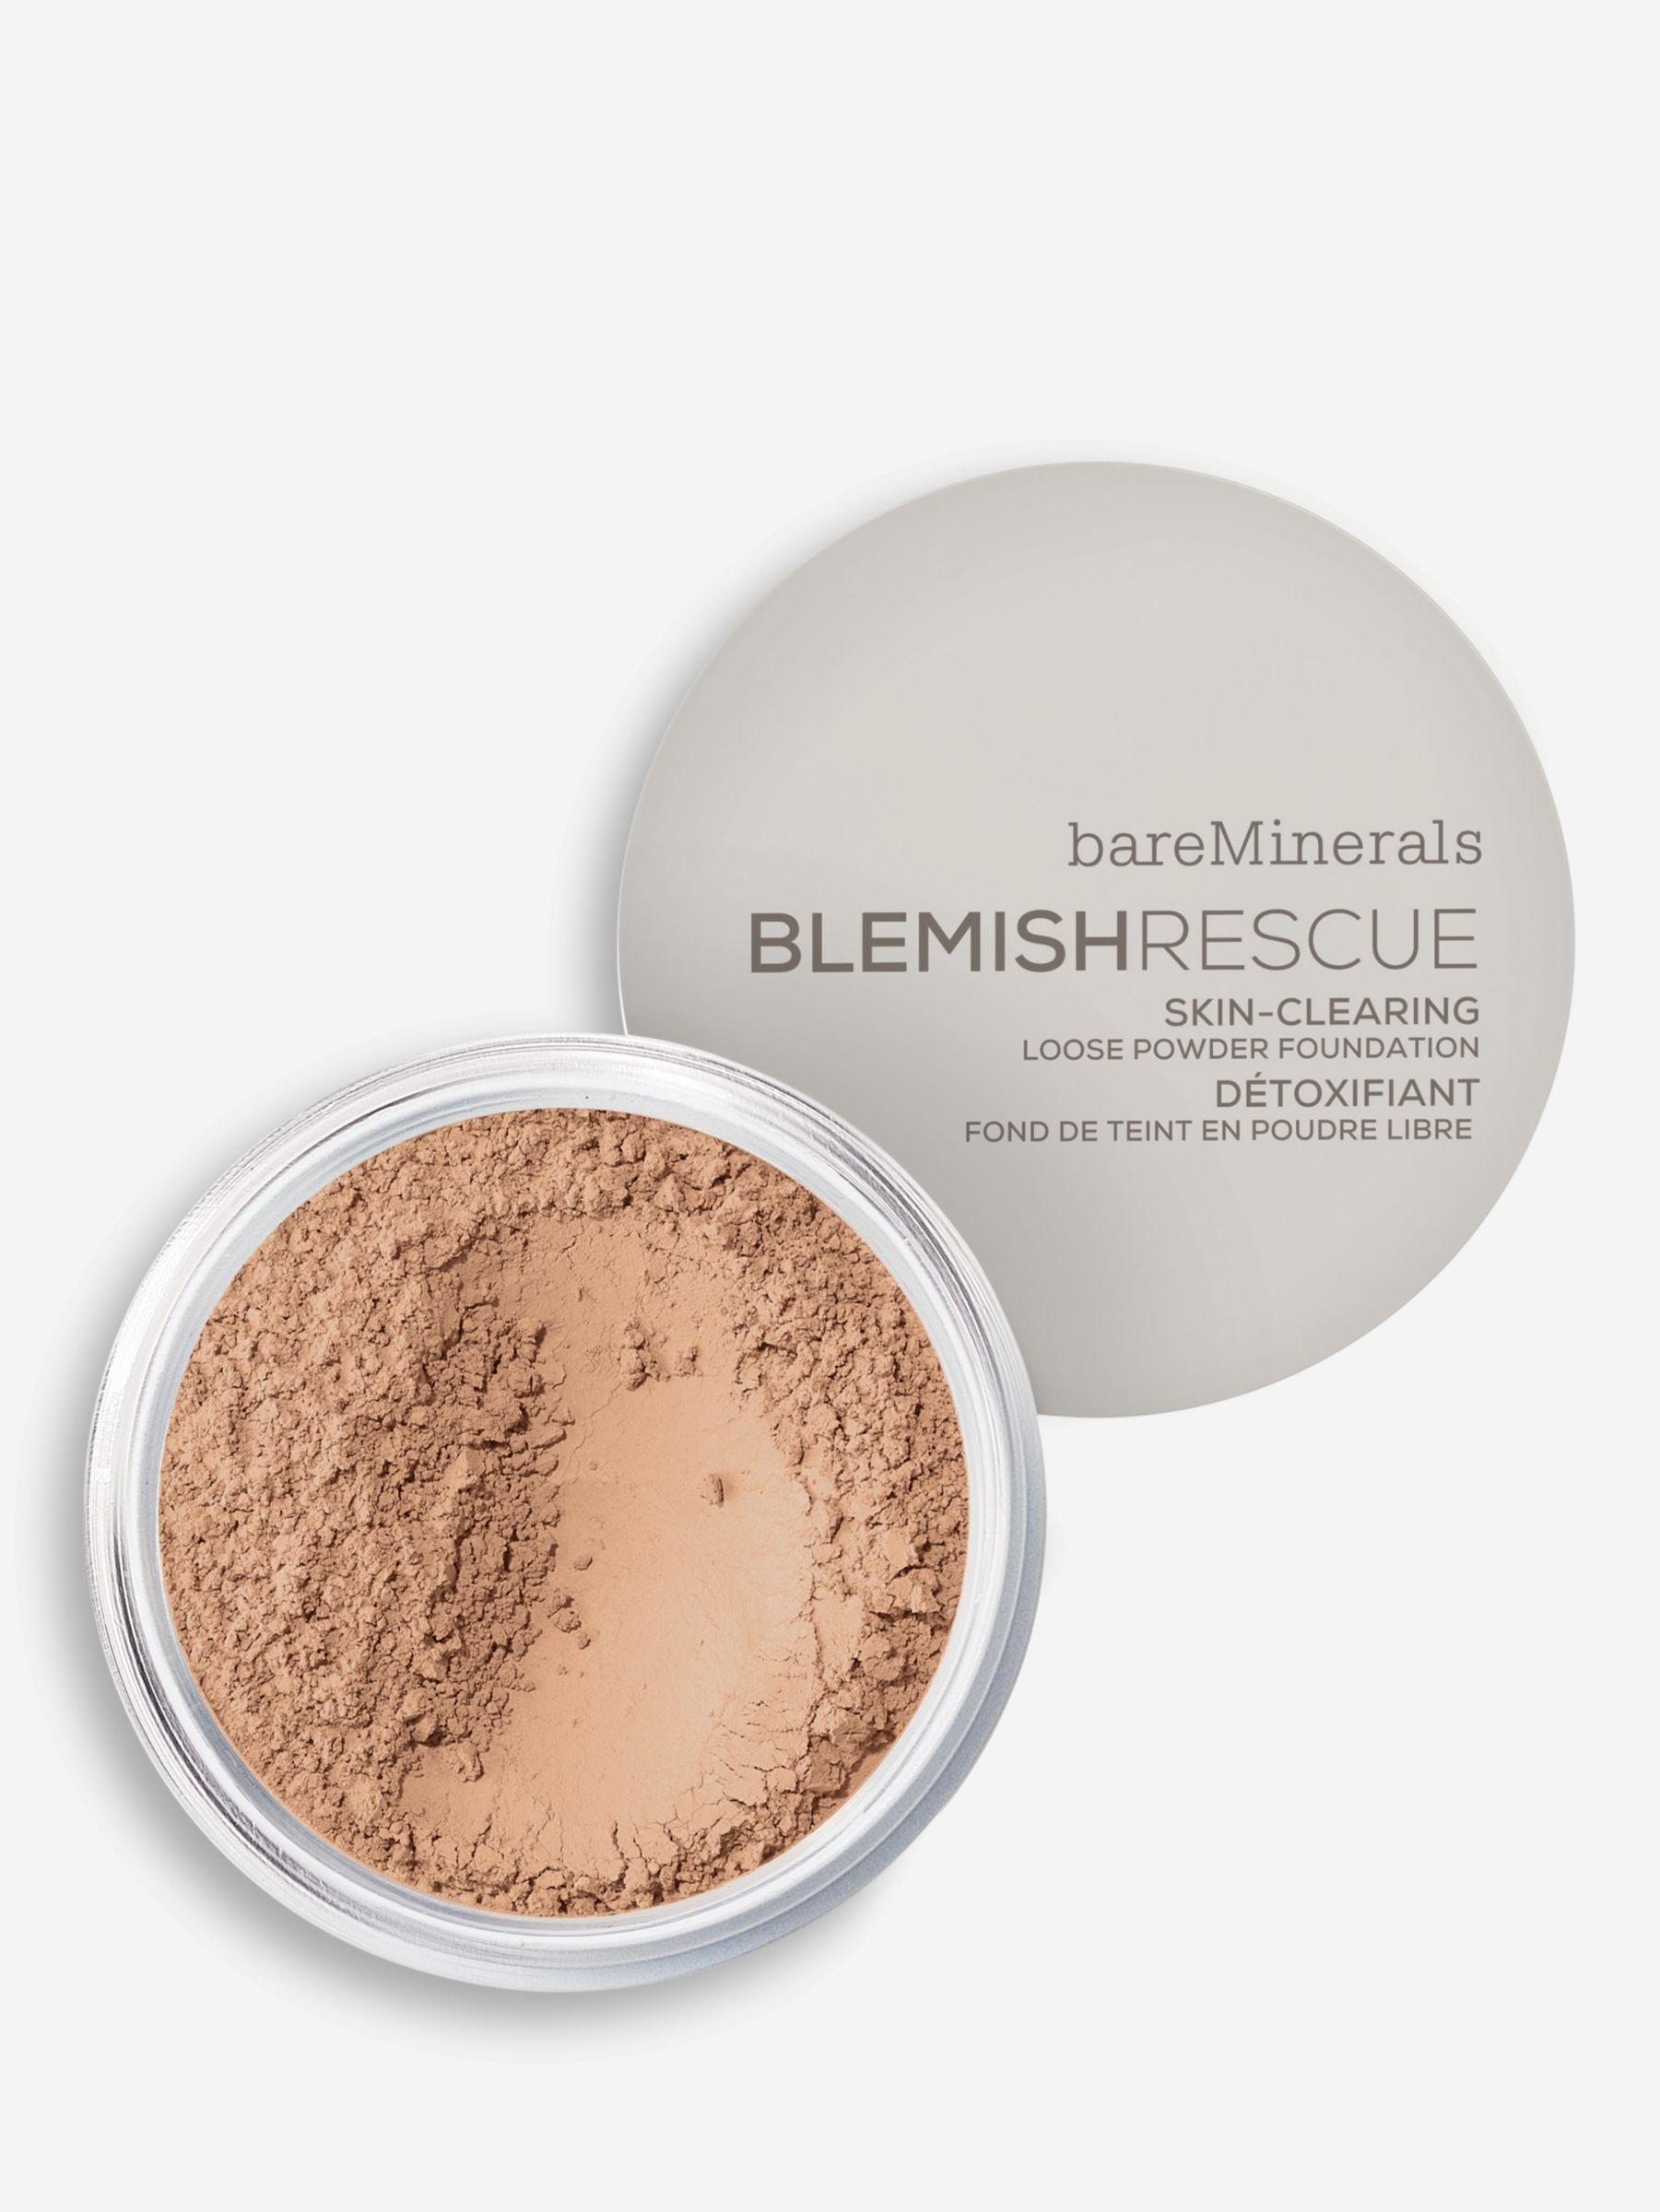 bareMinerals bareMinerals BlemishRescue™ Skin-Clearing Loose Powder Foundation